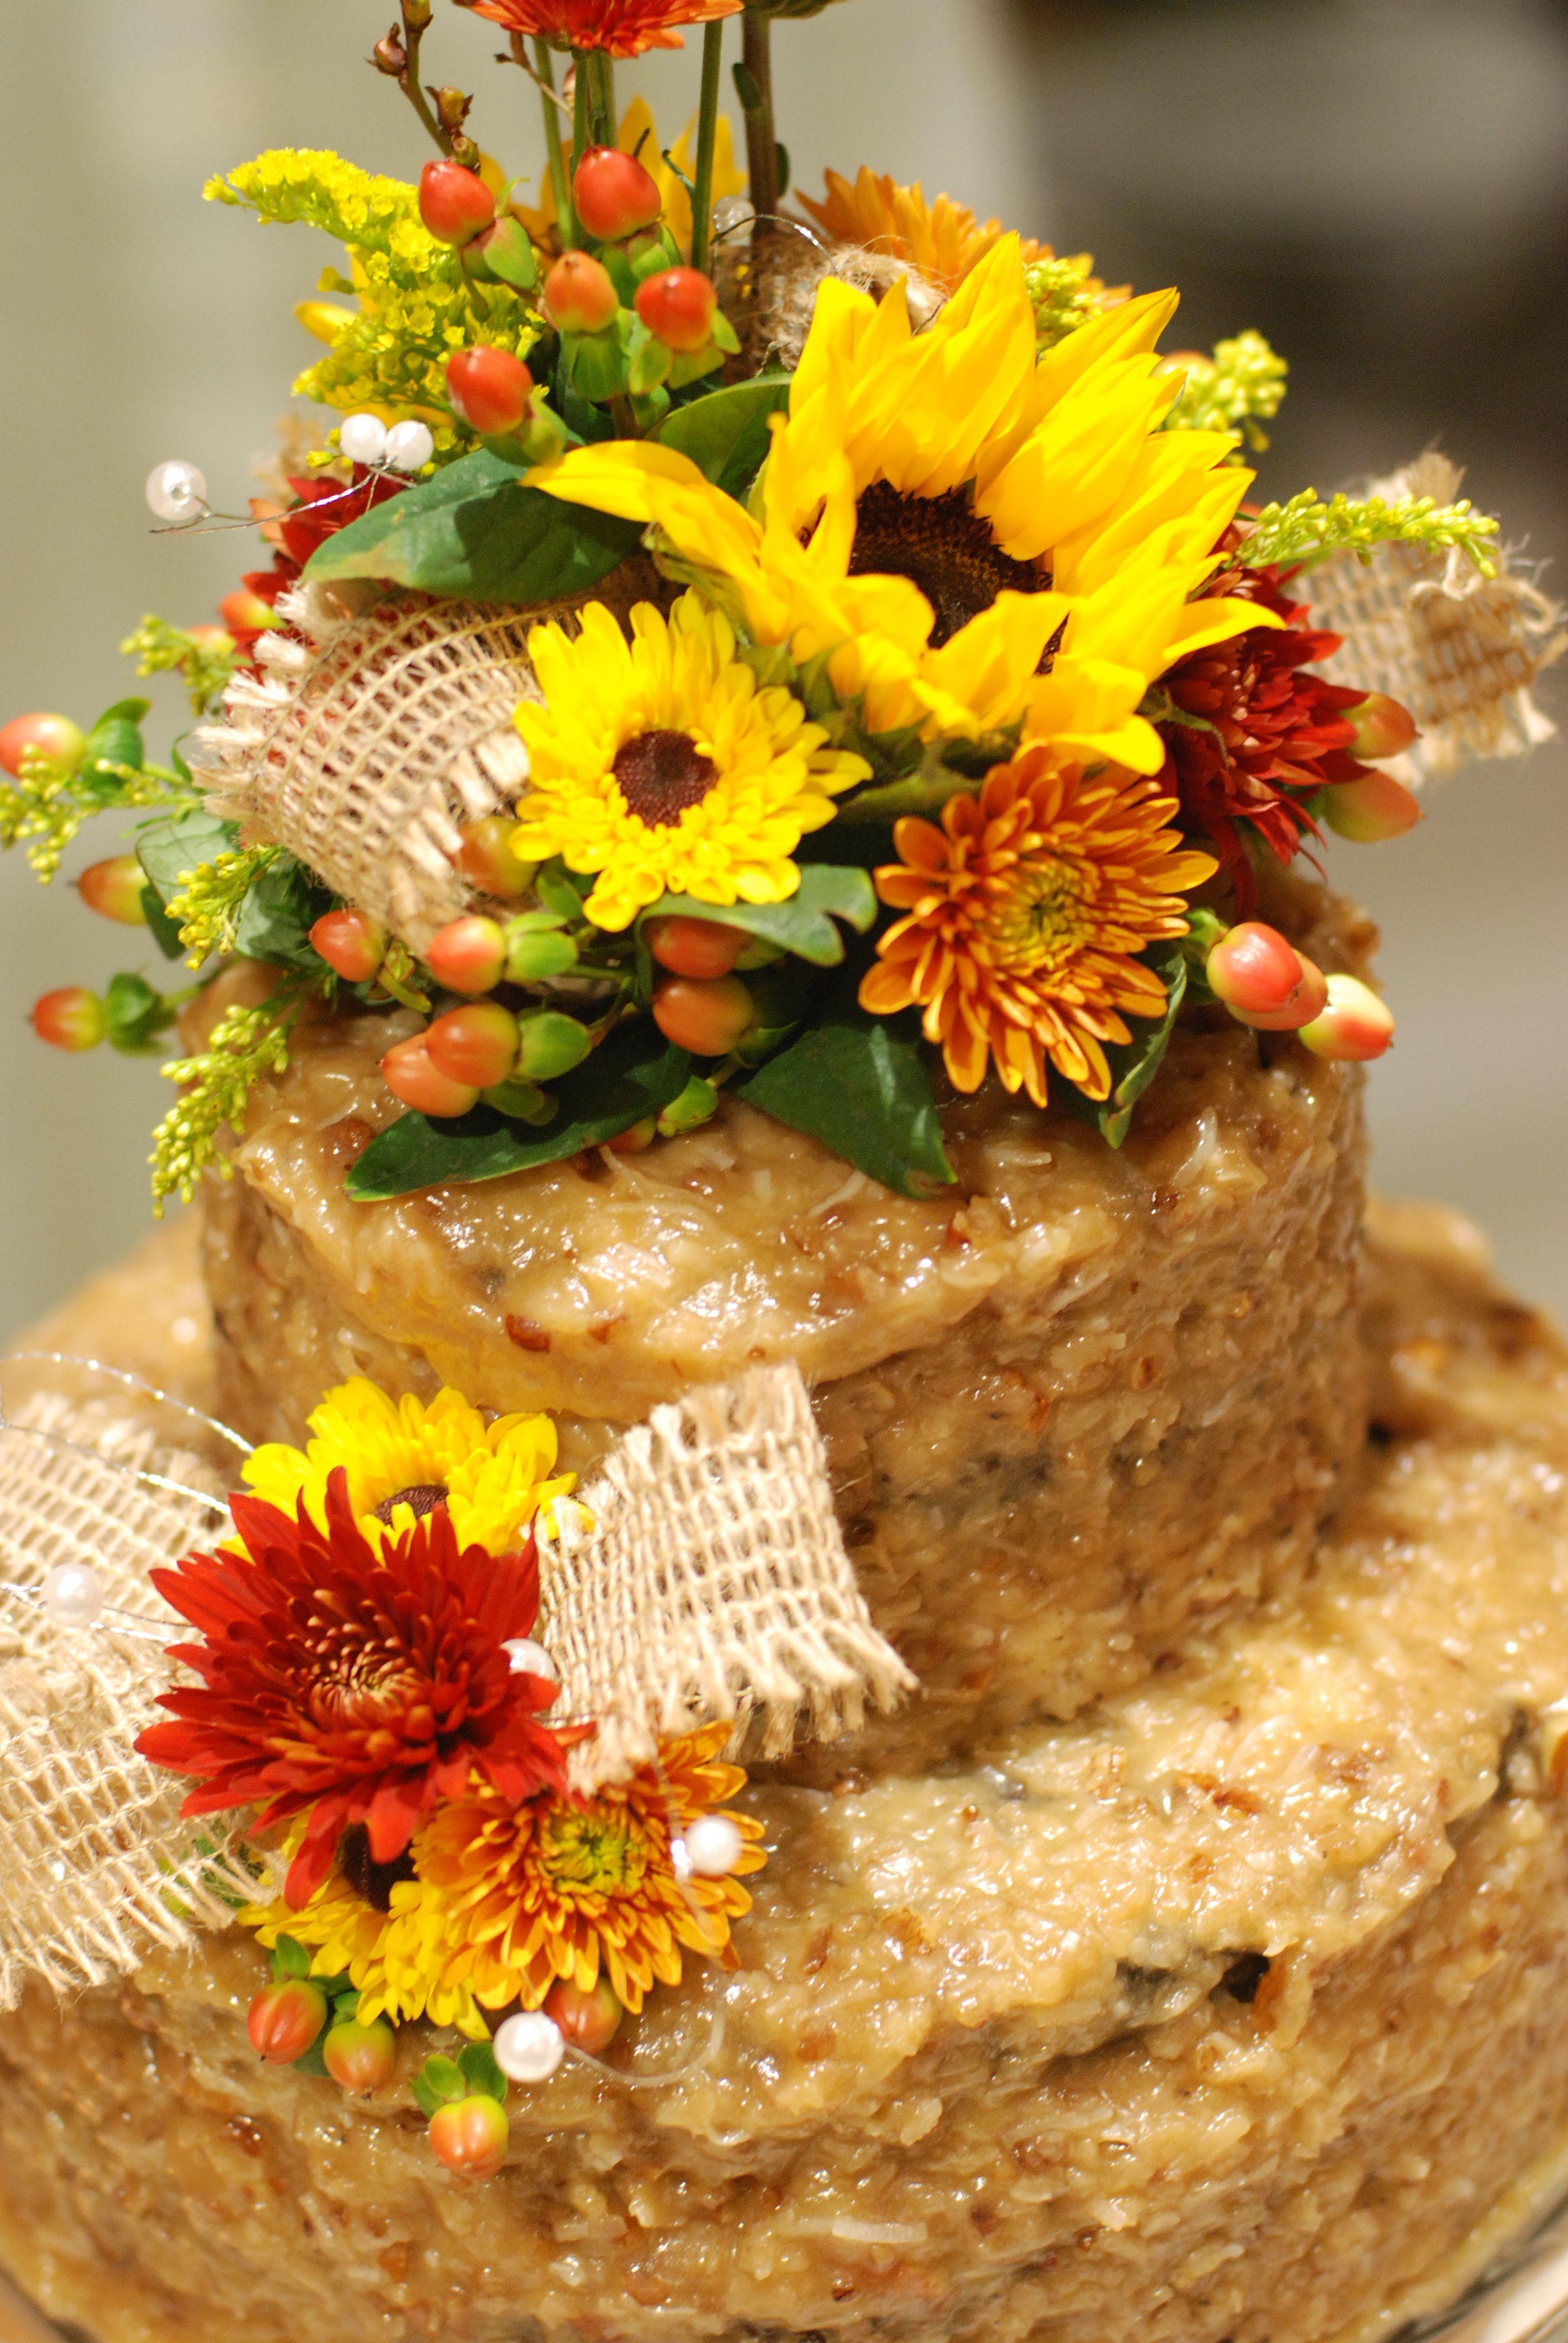 German Chocolate Wedding Cake | Rustic Wedding | Pinterest | Wedding ...